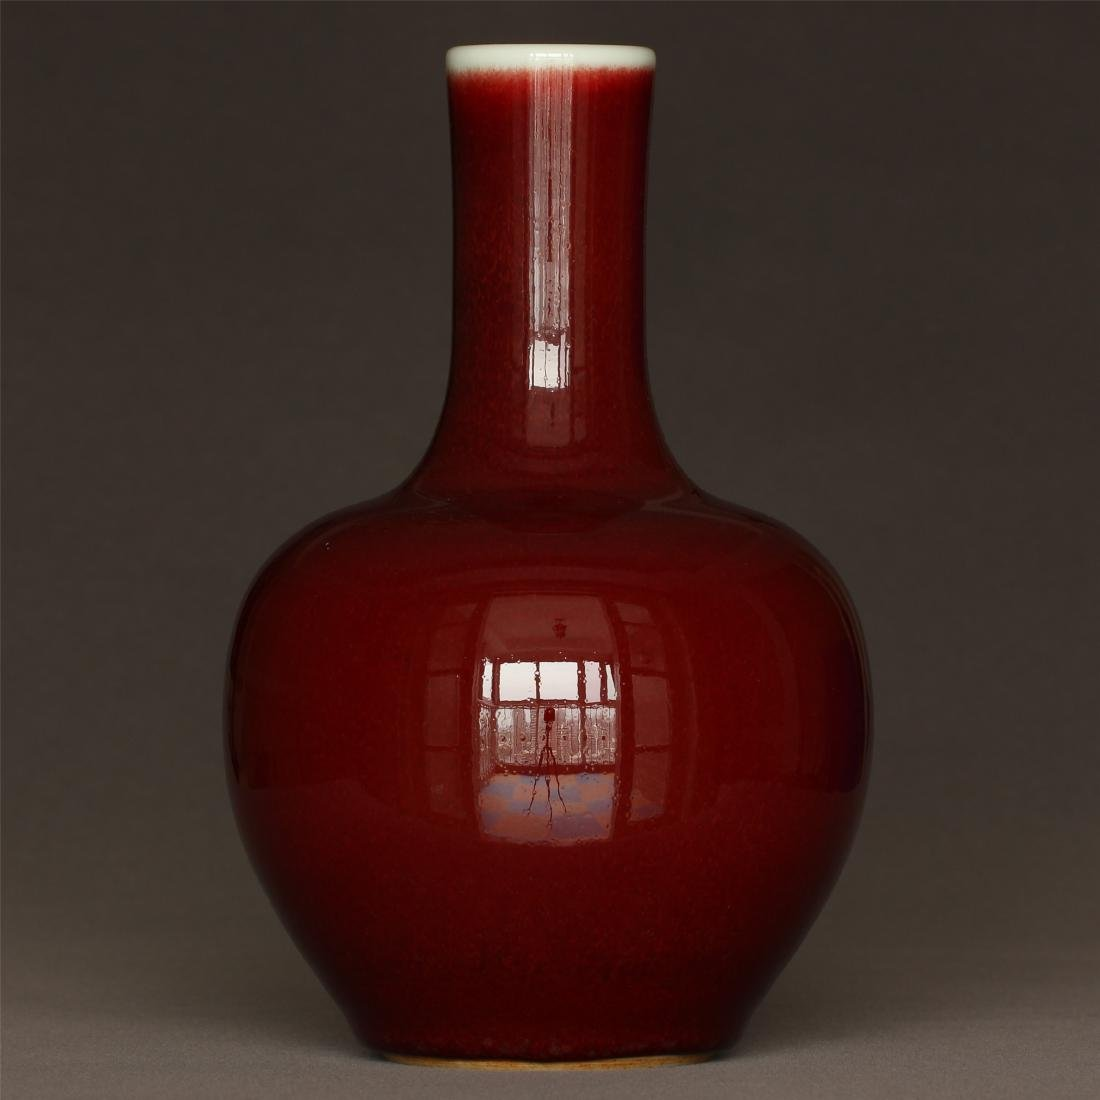 Red glaze porcelain vase of Qing Dynasty KangXi mark.